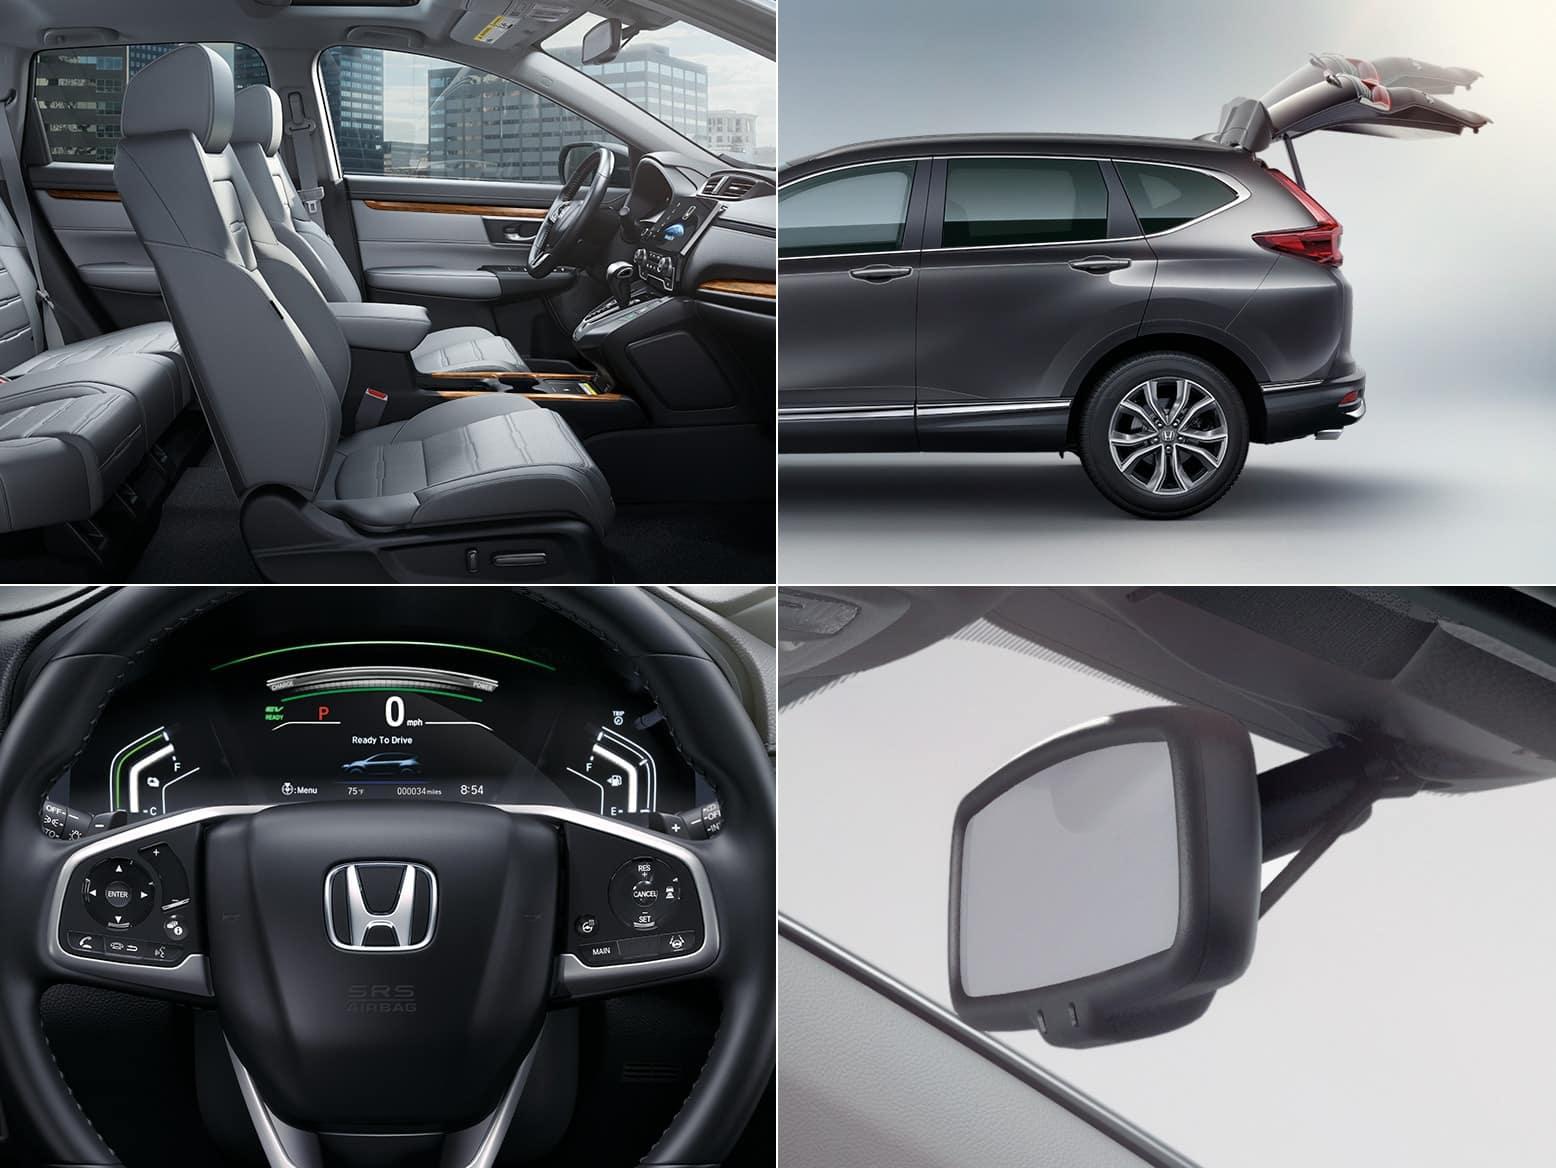 2021 Honda CR-V Hybrid EX-L features